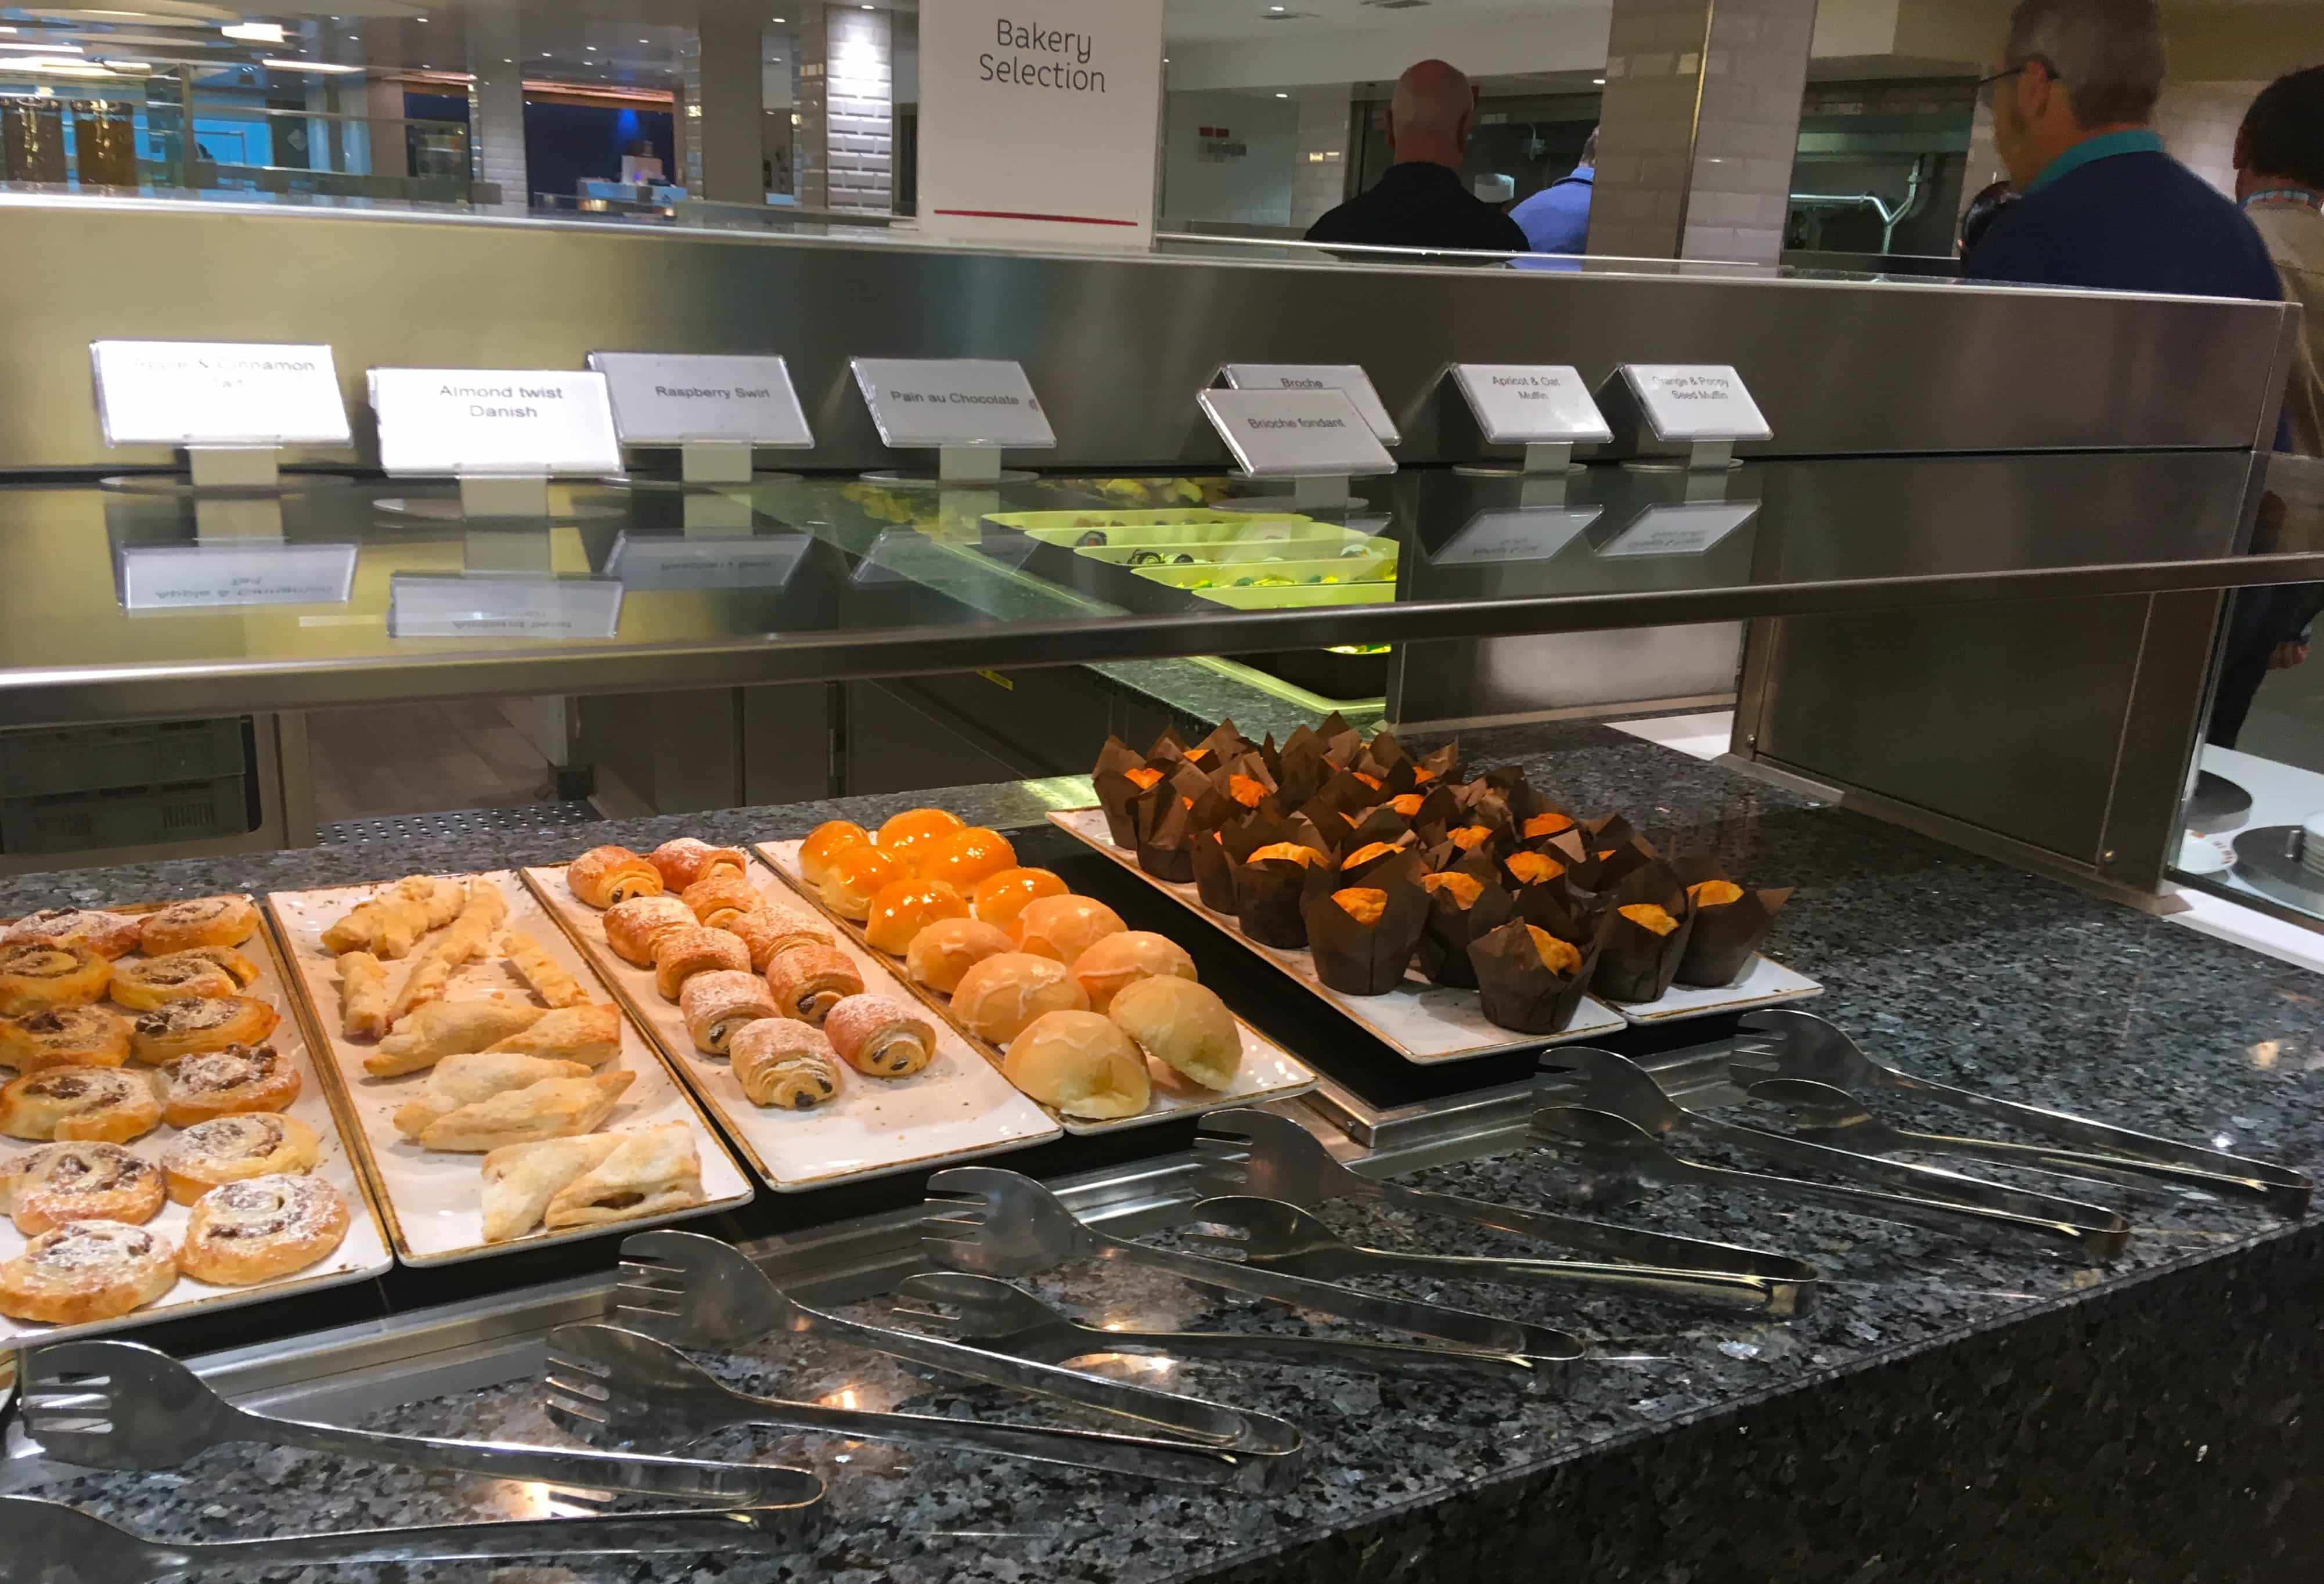 p&o britannia buffet bakery iced buns muffins